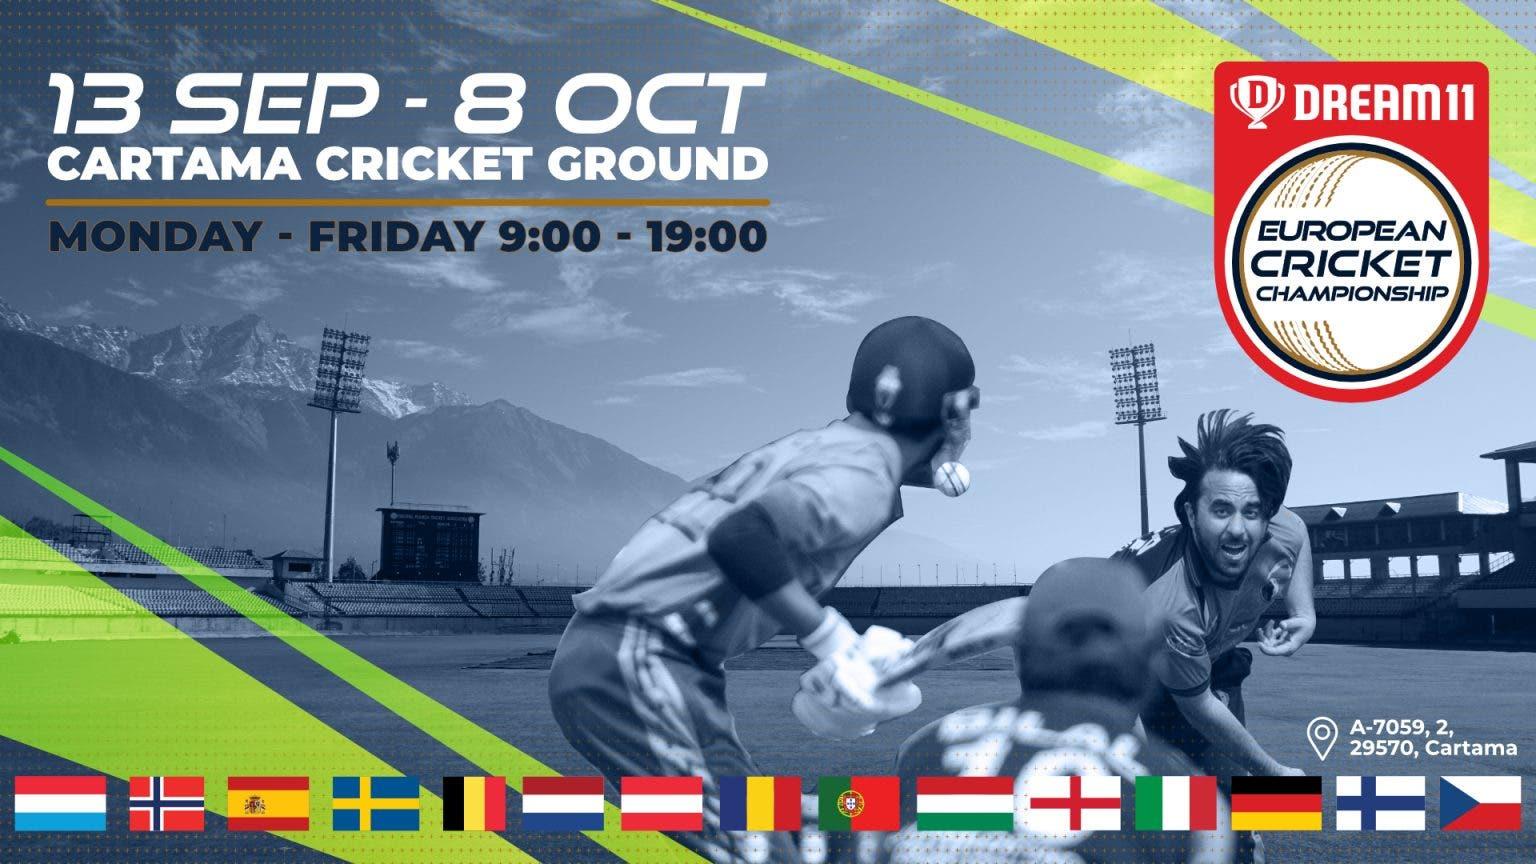 European Cricket Championship